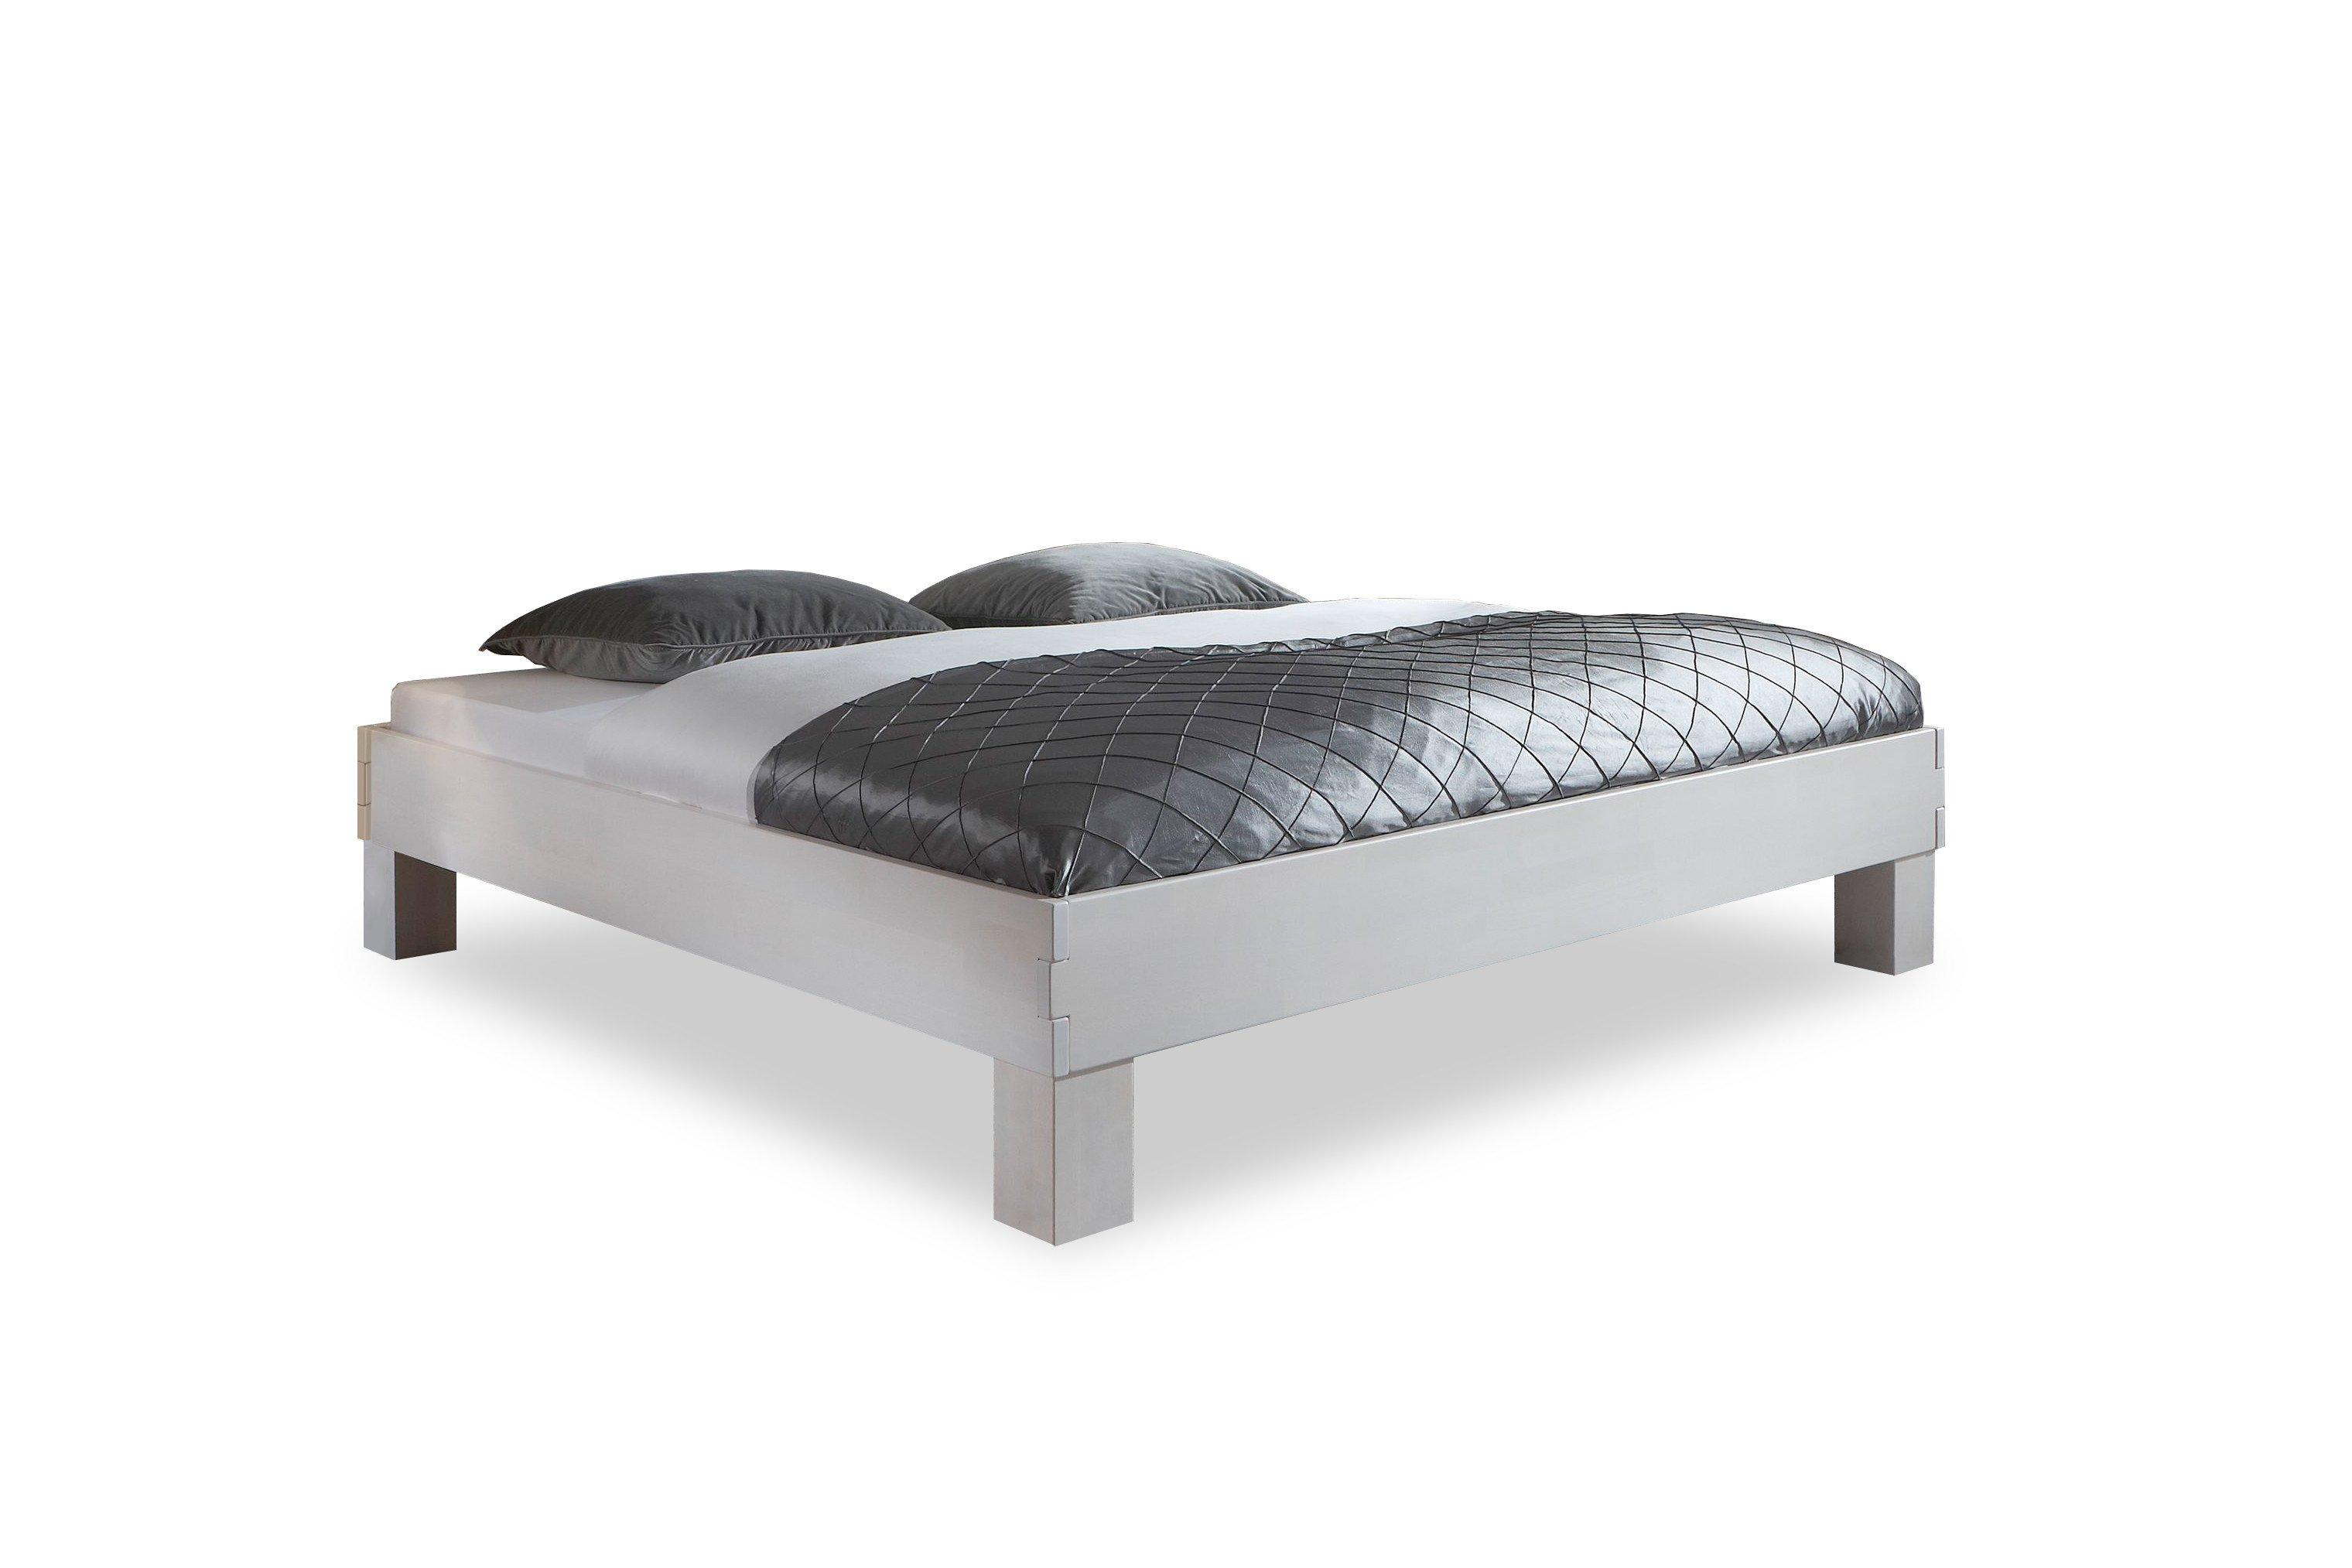 dico m bel classic wei buche m bel letz ihr online shop. Black Bedroom Furniture Sets. Home Design Ideas